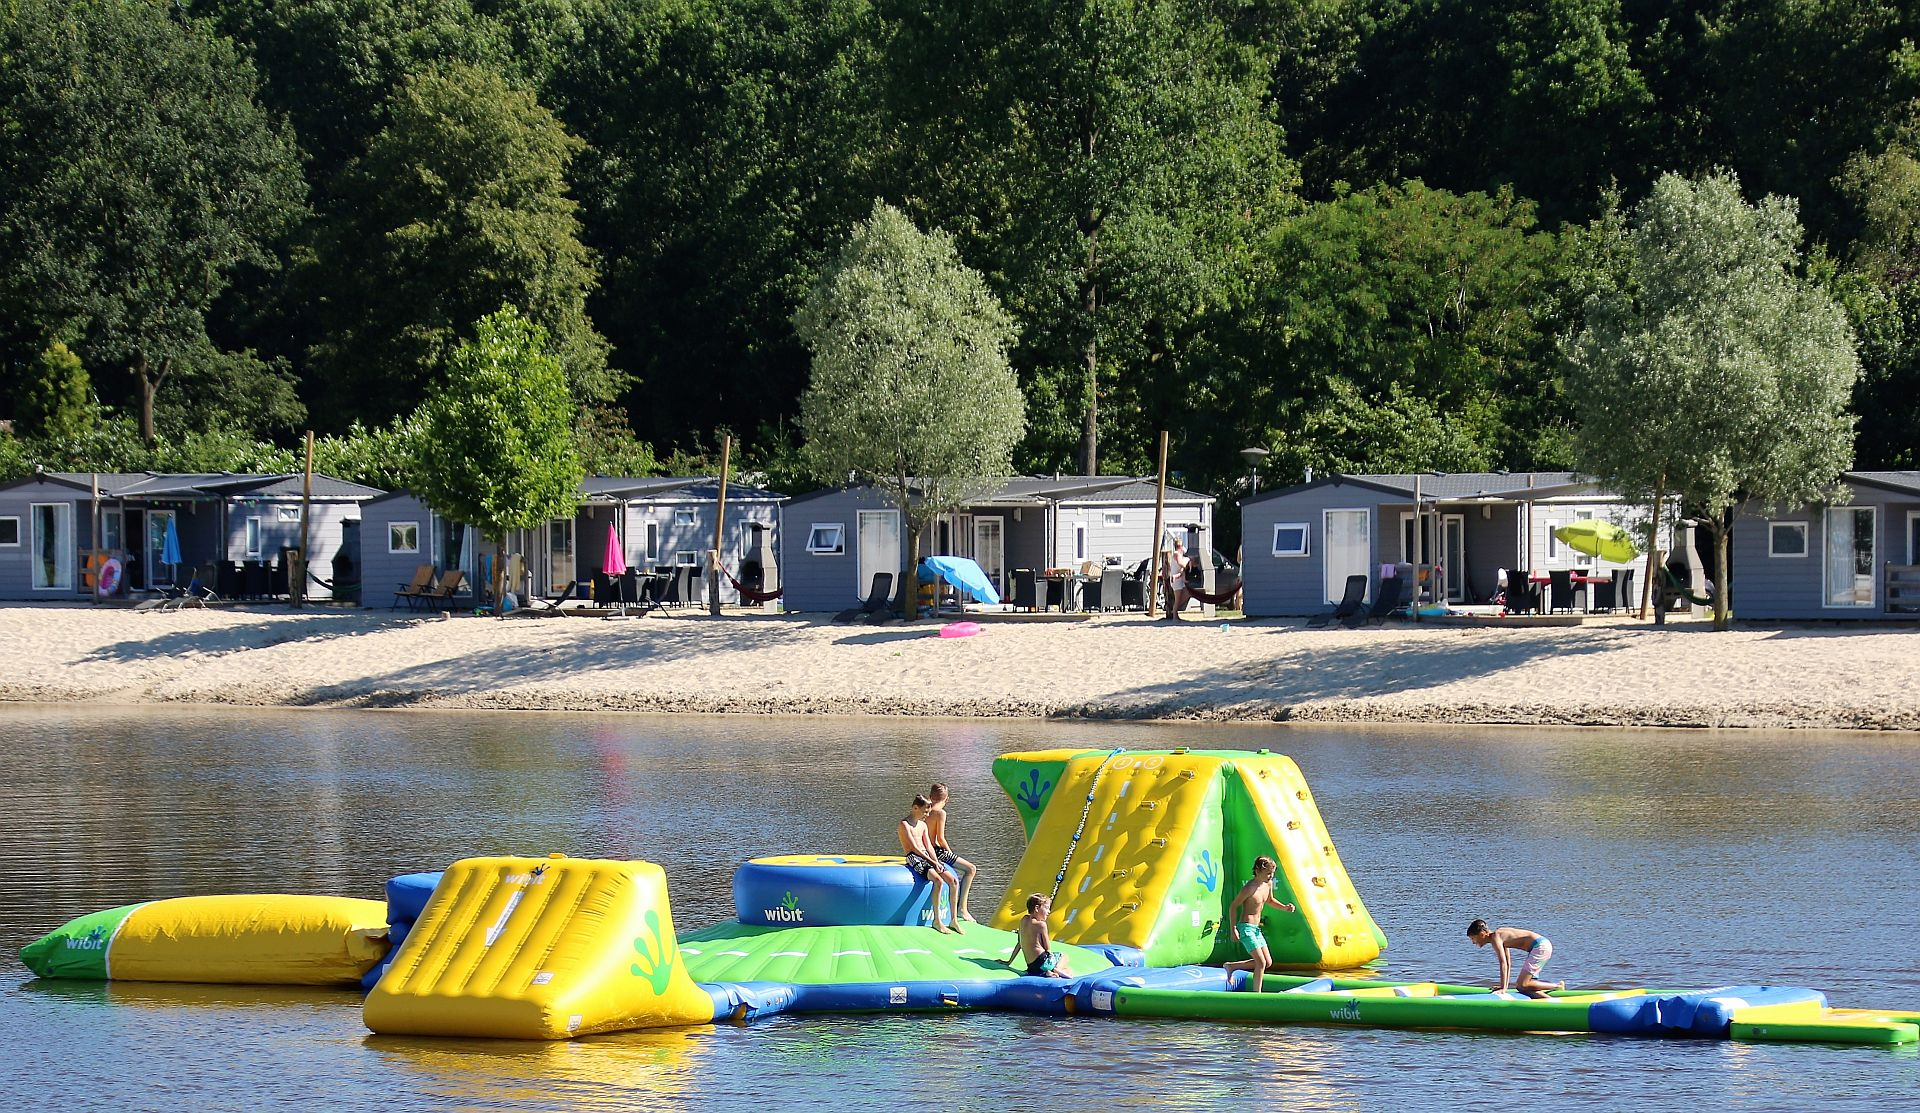 5 Sterne Campingplatz in Hardenberg Het Stoetenslagh - Campingplatz Hardenberg Stoetenslagh